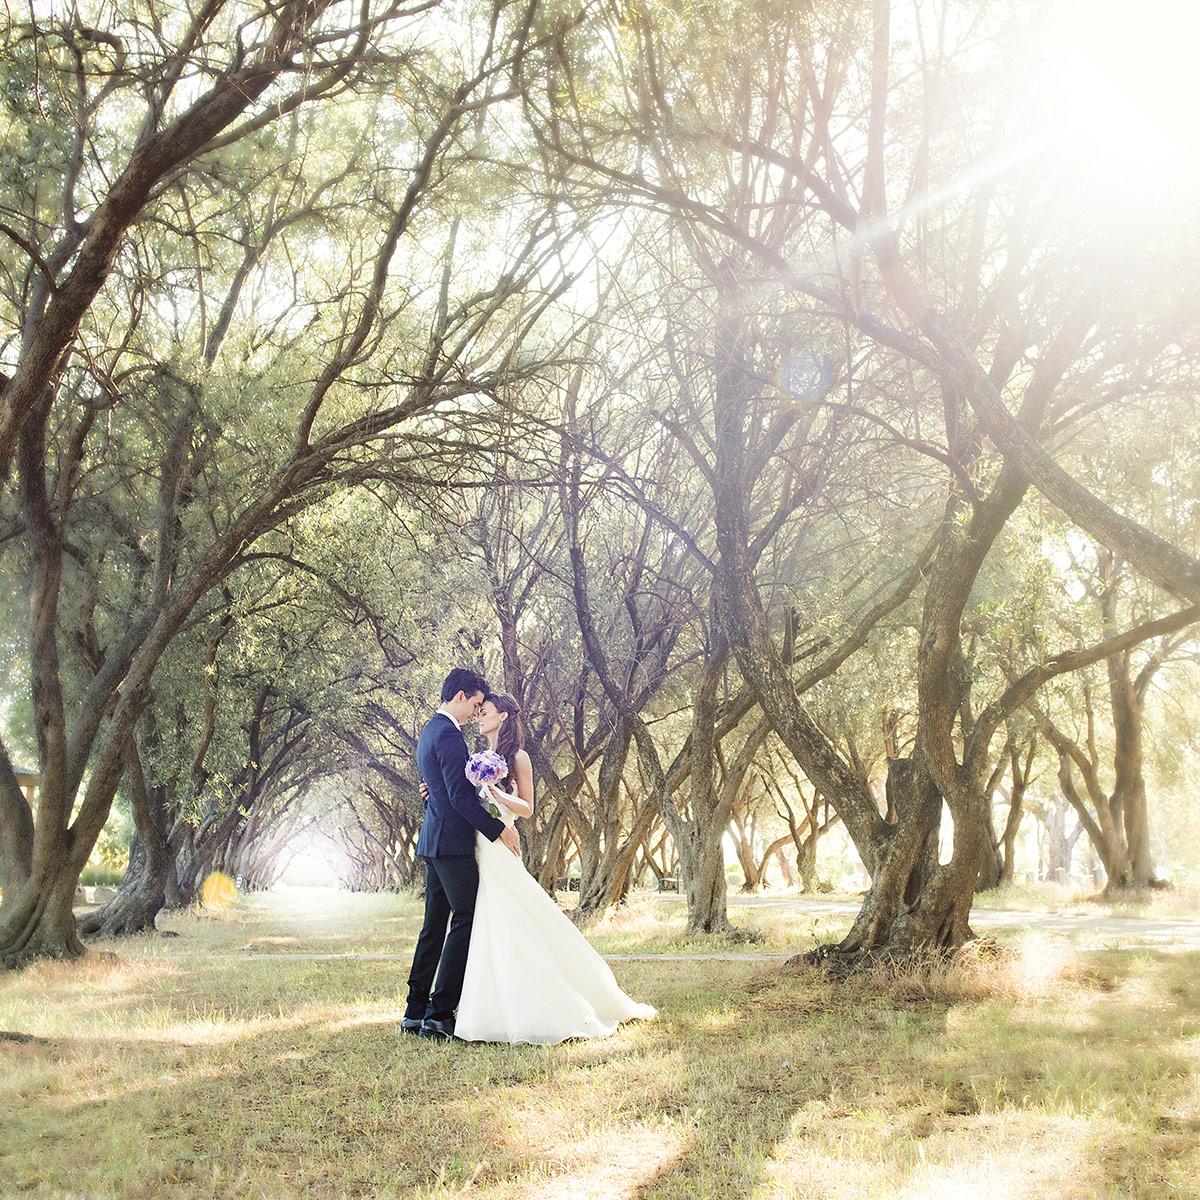 Bride and groom walking in olive trees